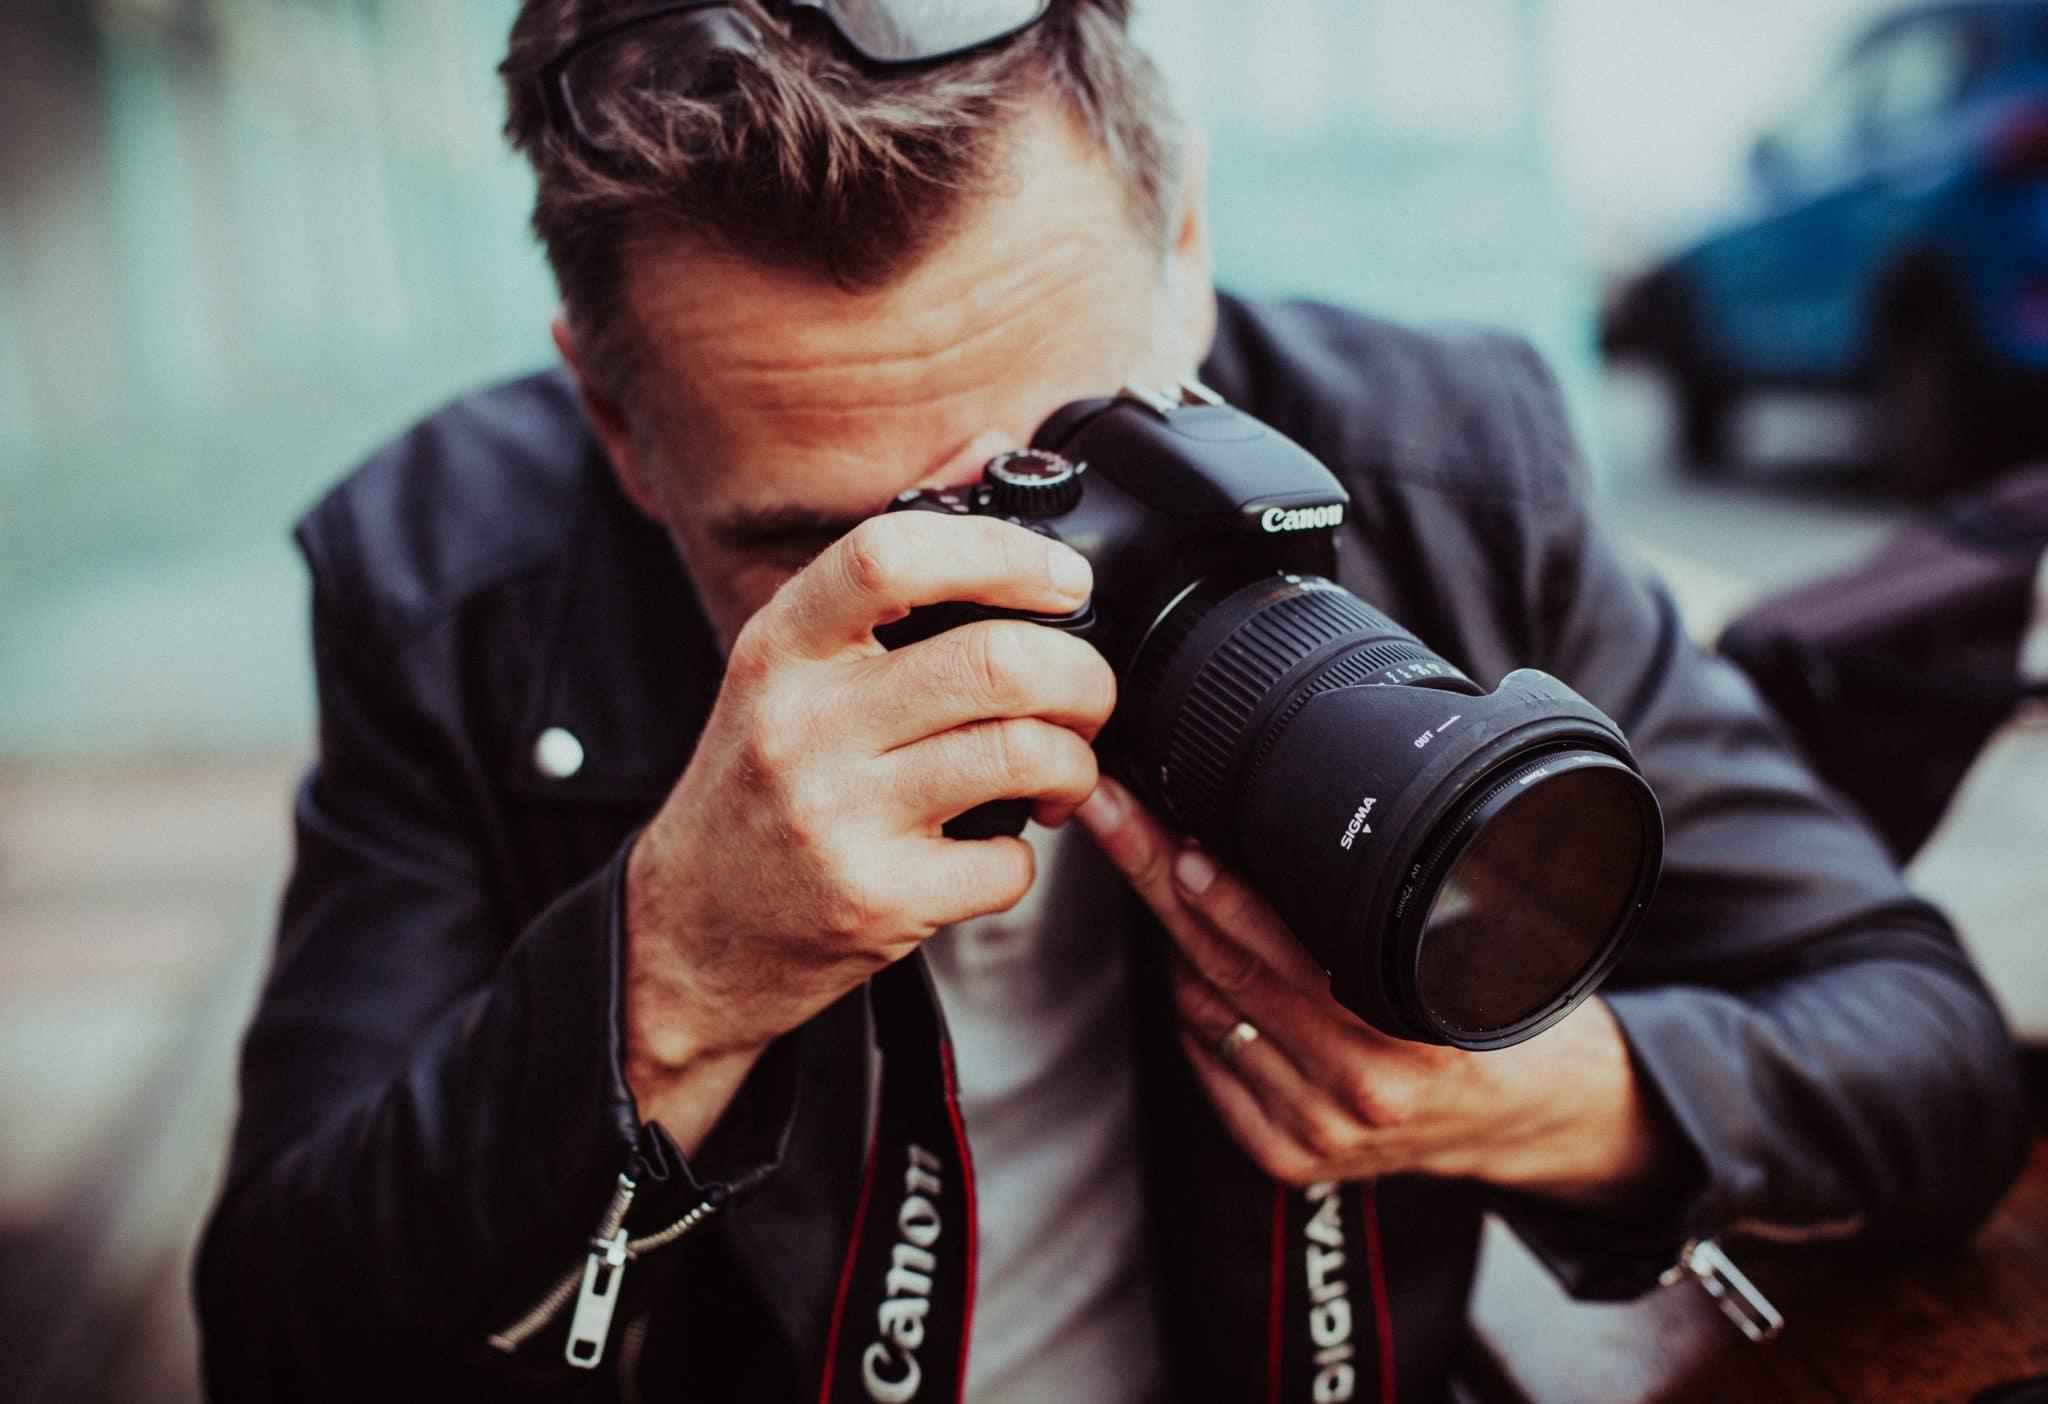 Property photographer, interior Photographer, london property photographer, property photographer in london, photography, property photography, houses photographer, real estate, property, london property interior photographer